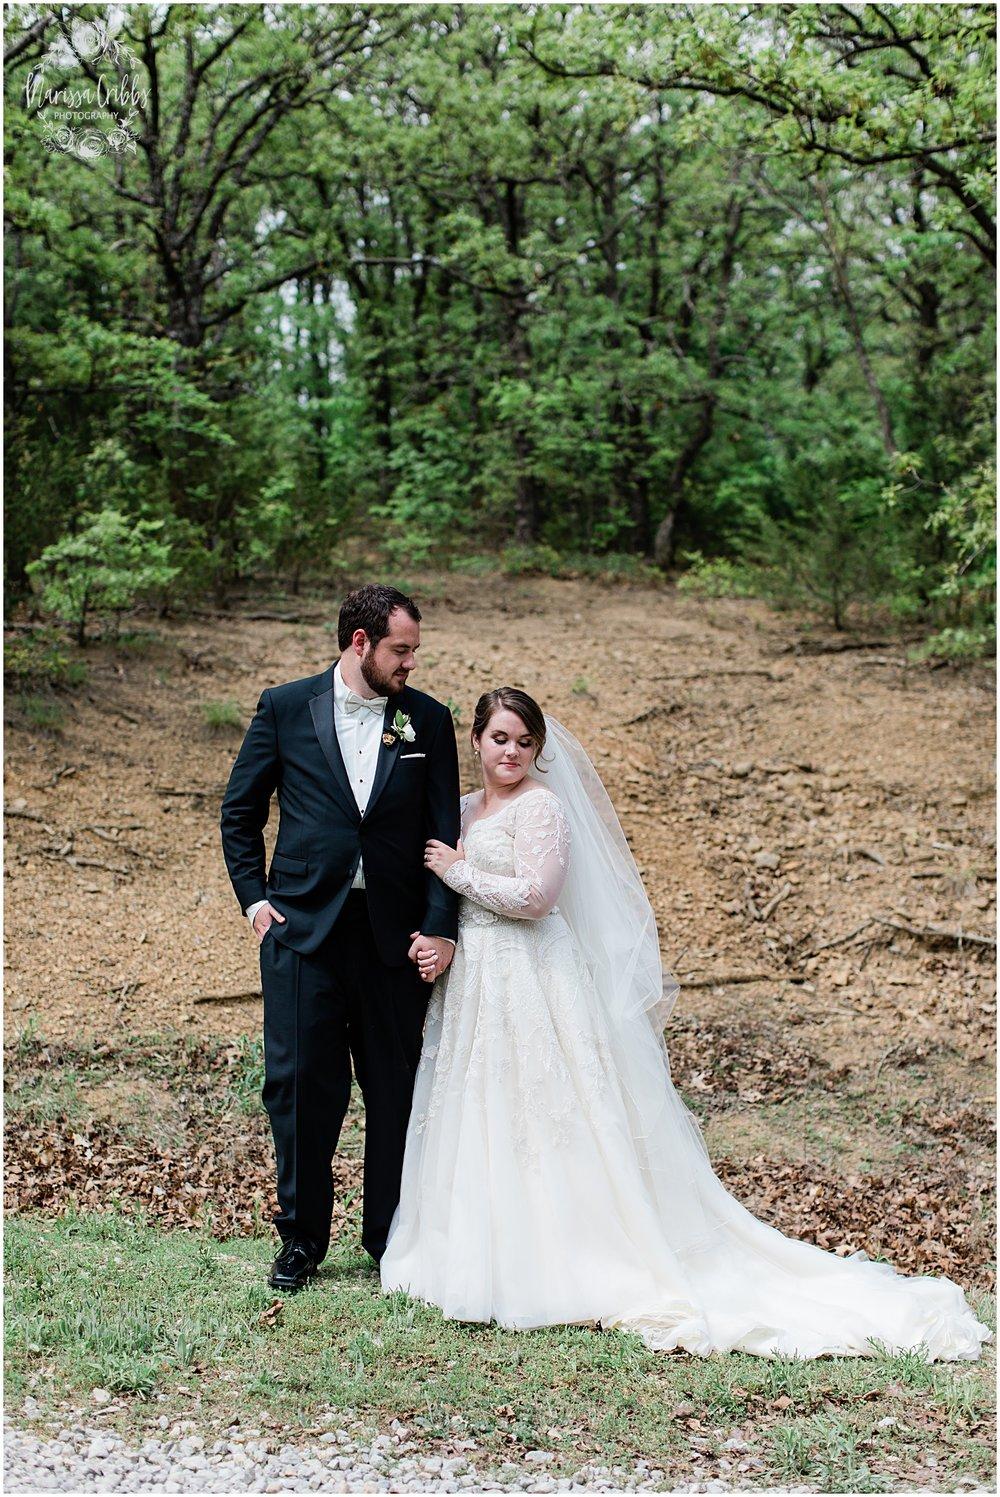 GORBY WEDDING | MARISSA CRIBBS PHOTOGRAPHY_5025.jpg